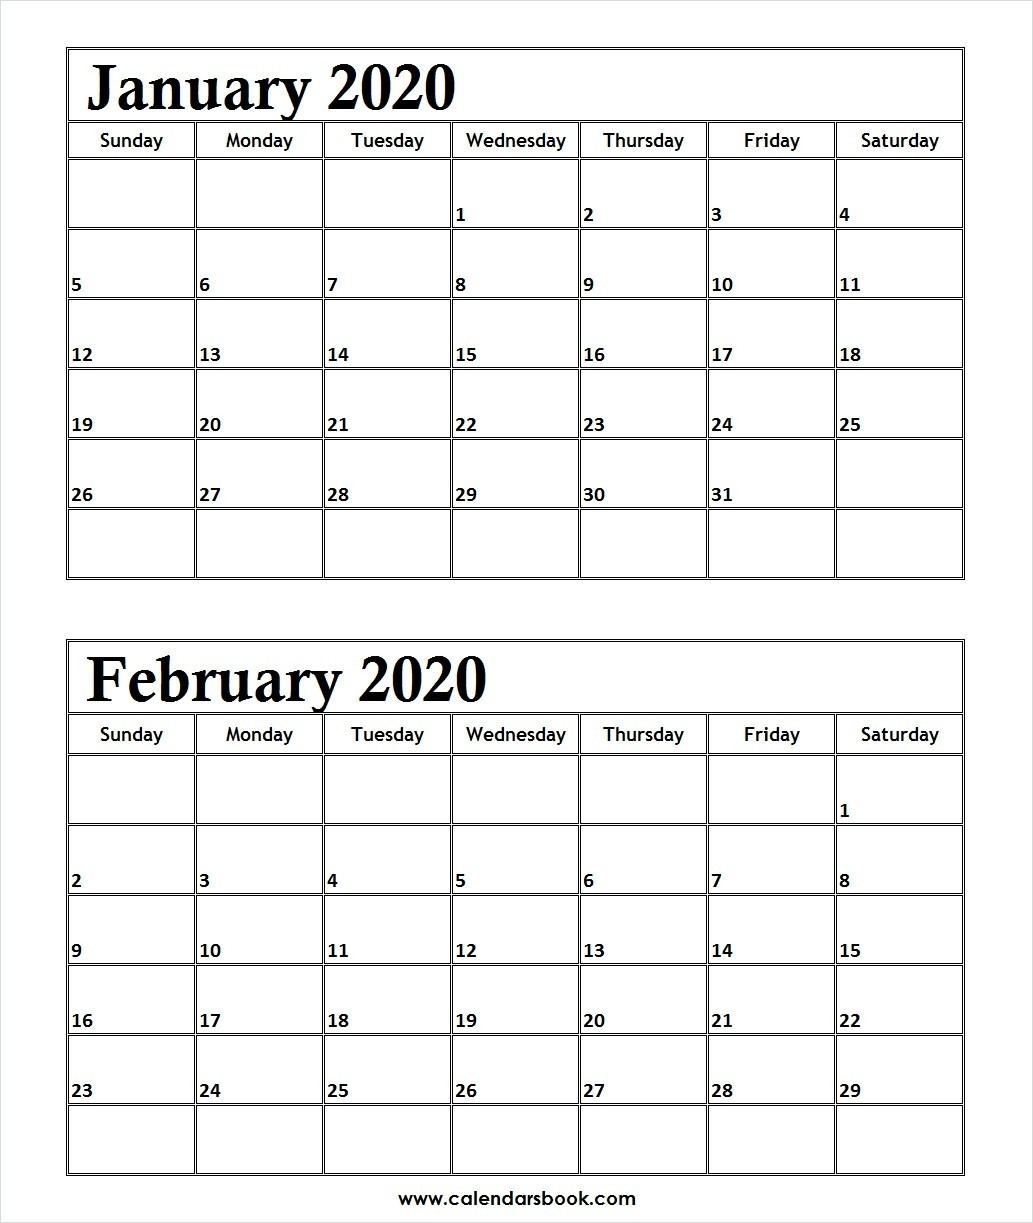 Print January February 2020 Calendar Template | 2 Month Calendar-January And February 2020 Printable Calendar